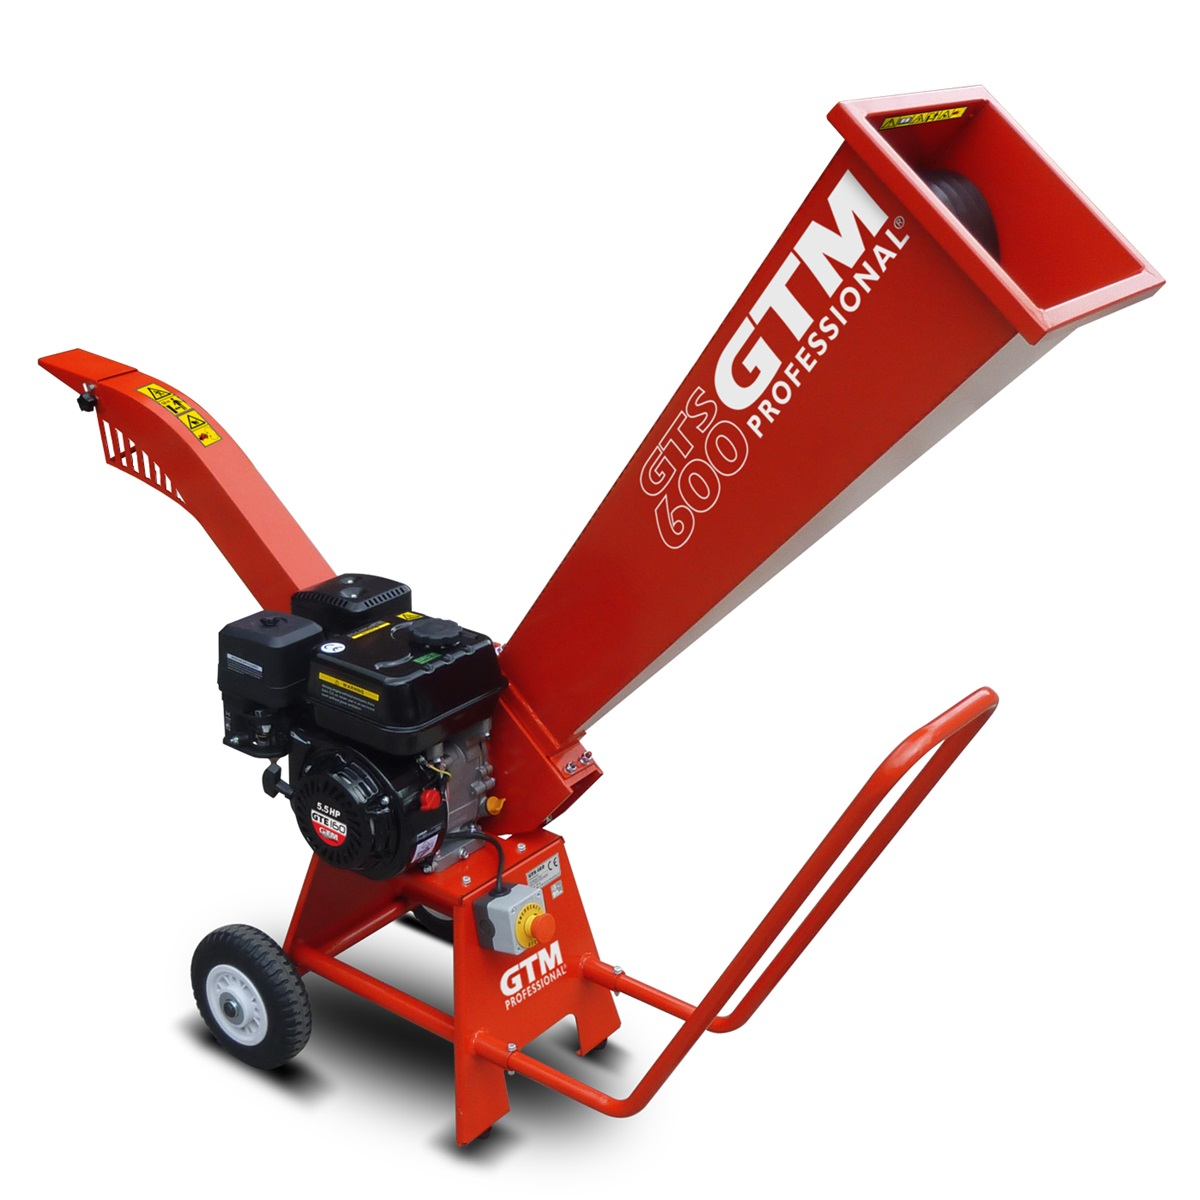 GTM GTS 600, drtič dřeva s benzinovým motorem